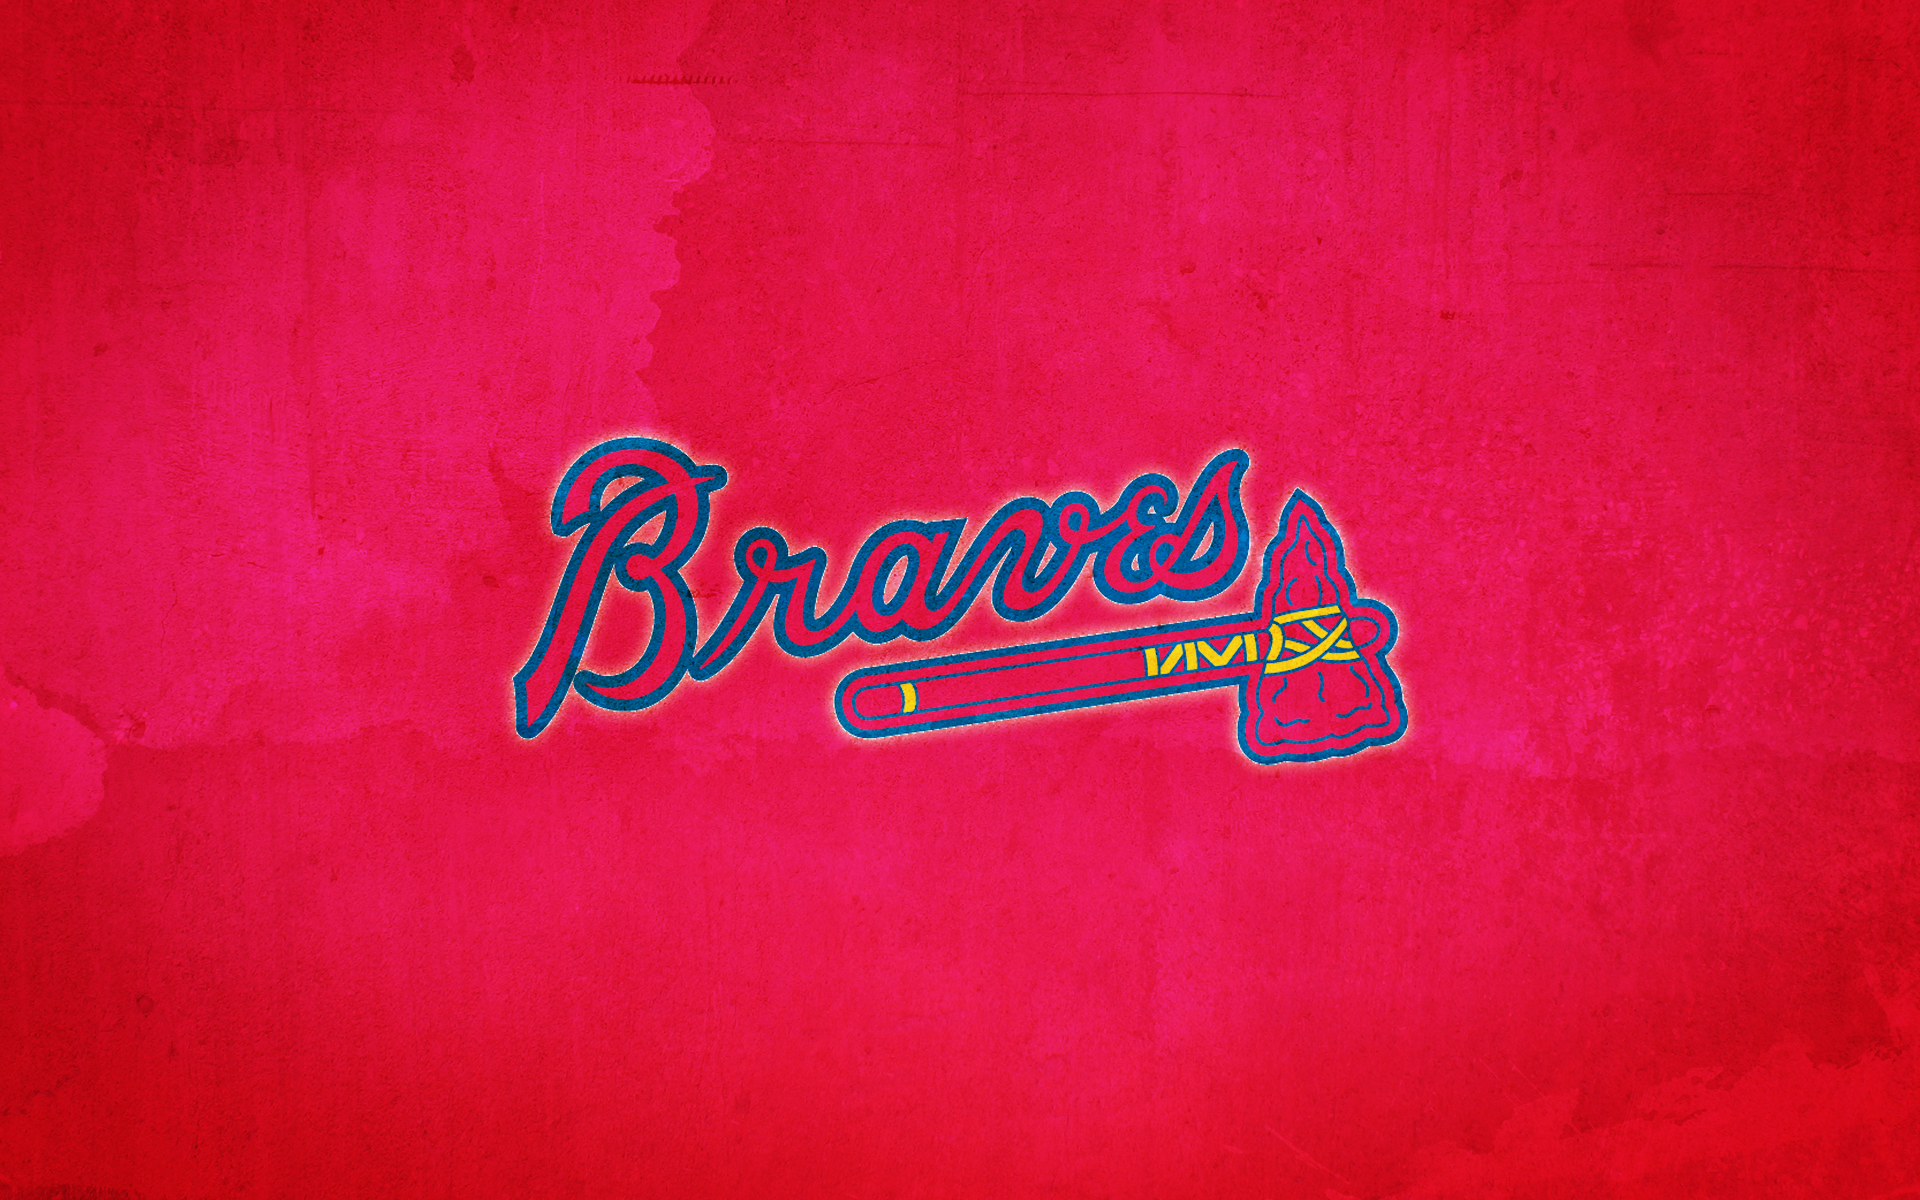 Atlanta Braves Wallpapers Hd Pixelstalk Net